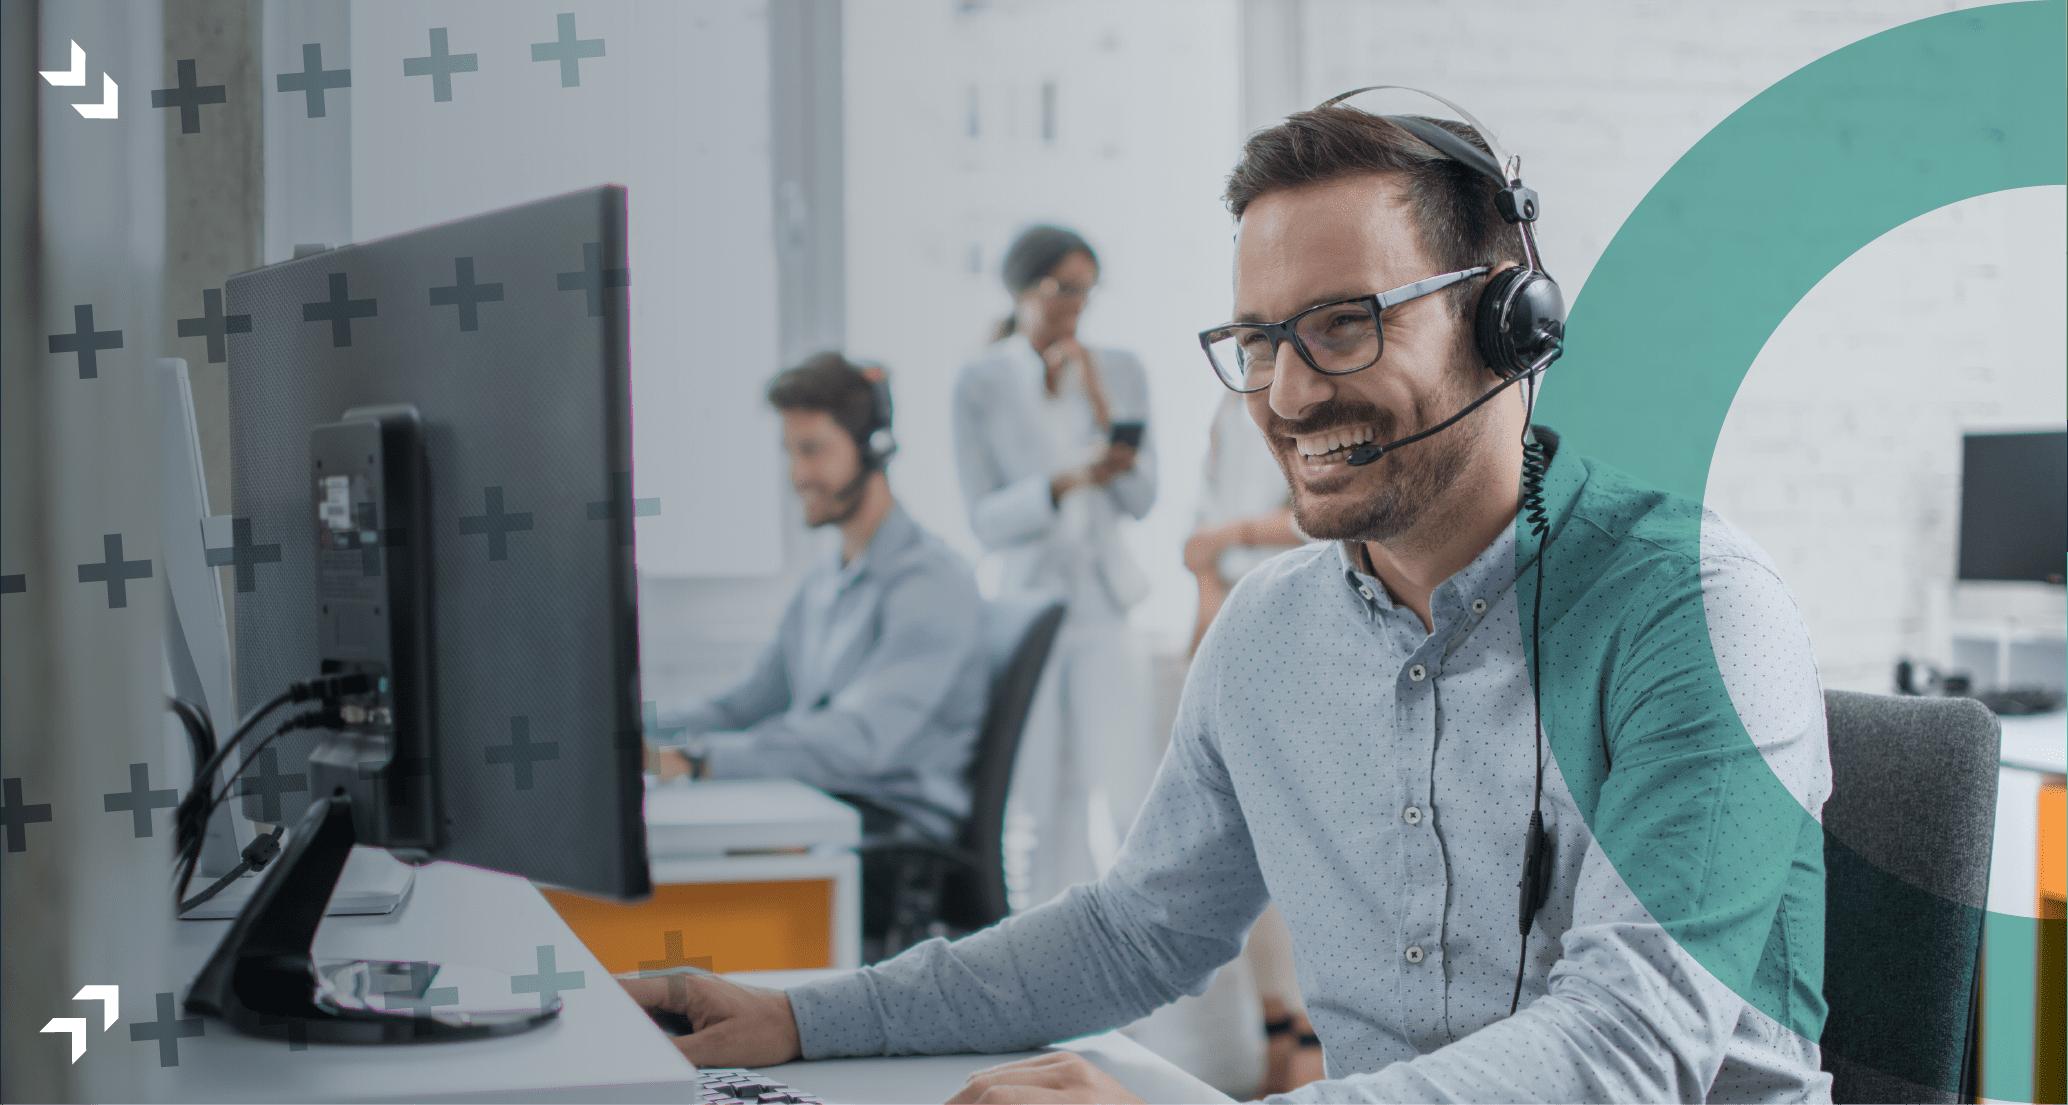 Man wearing headset, sat at a desk